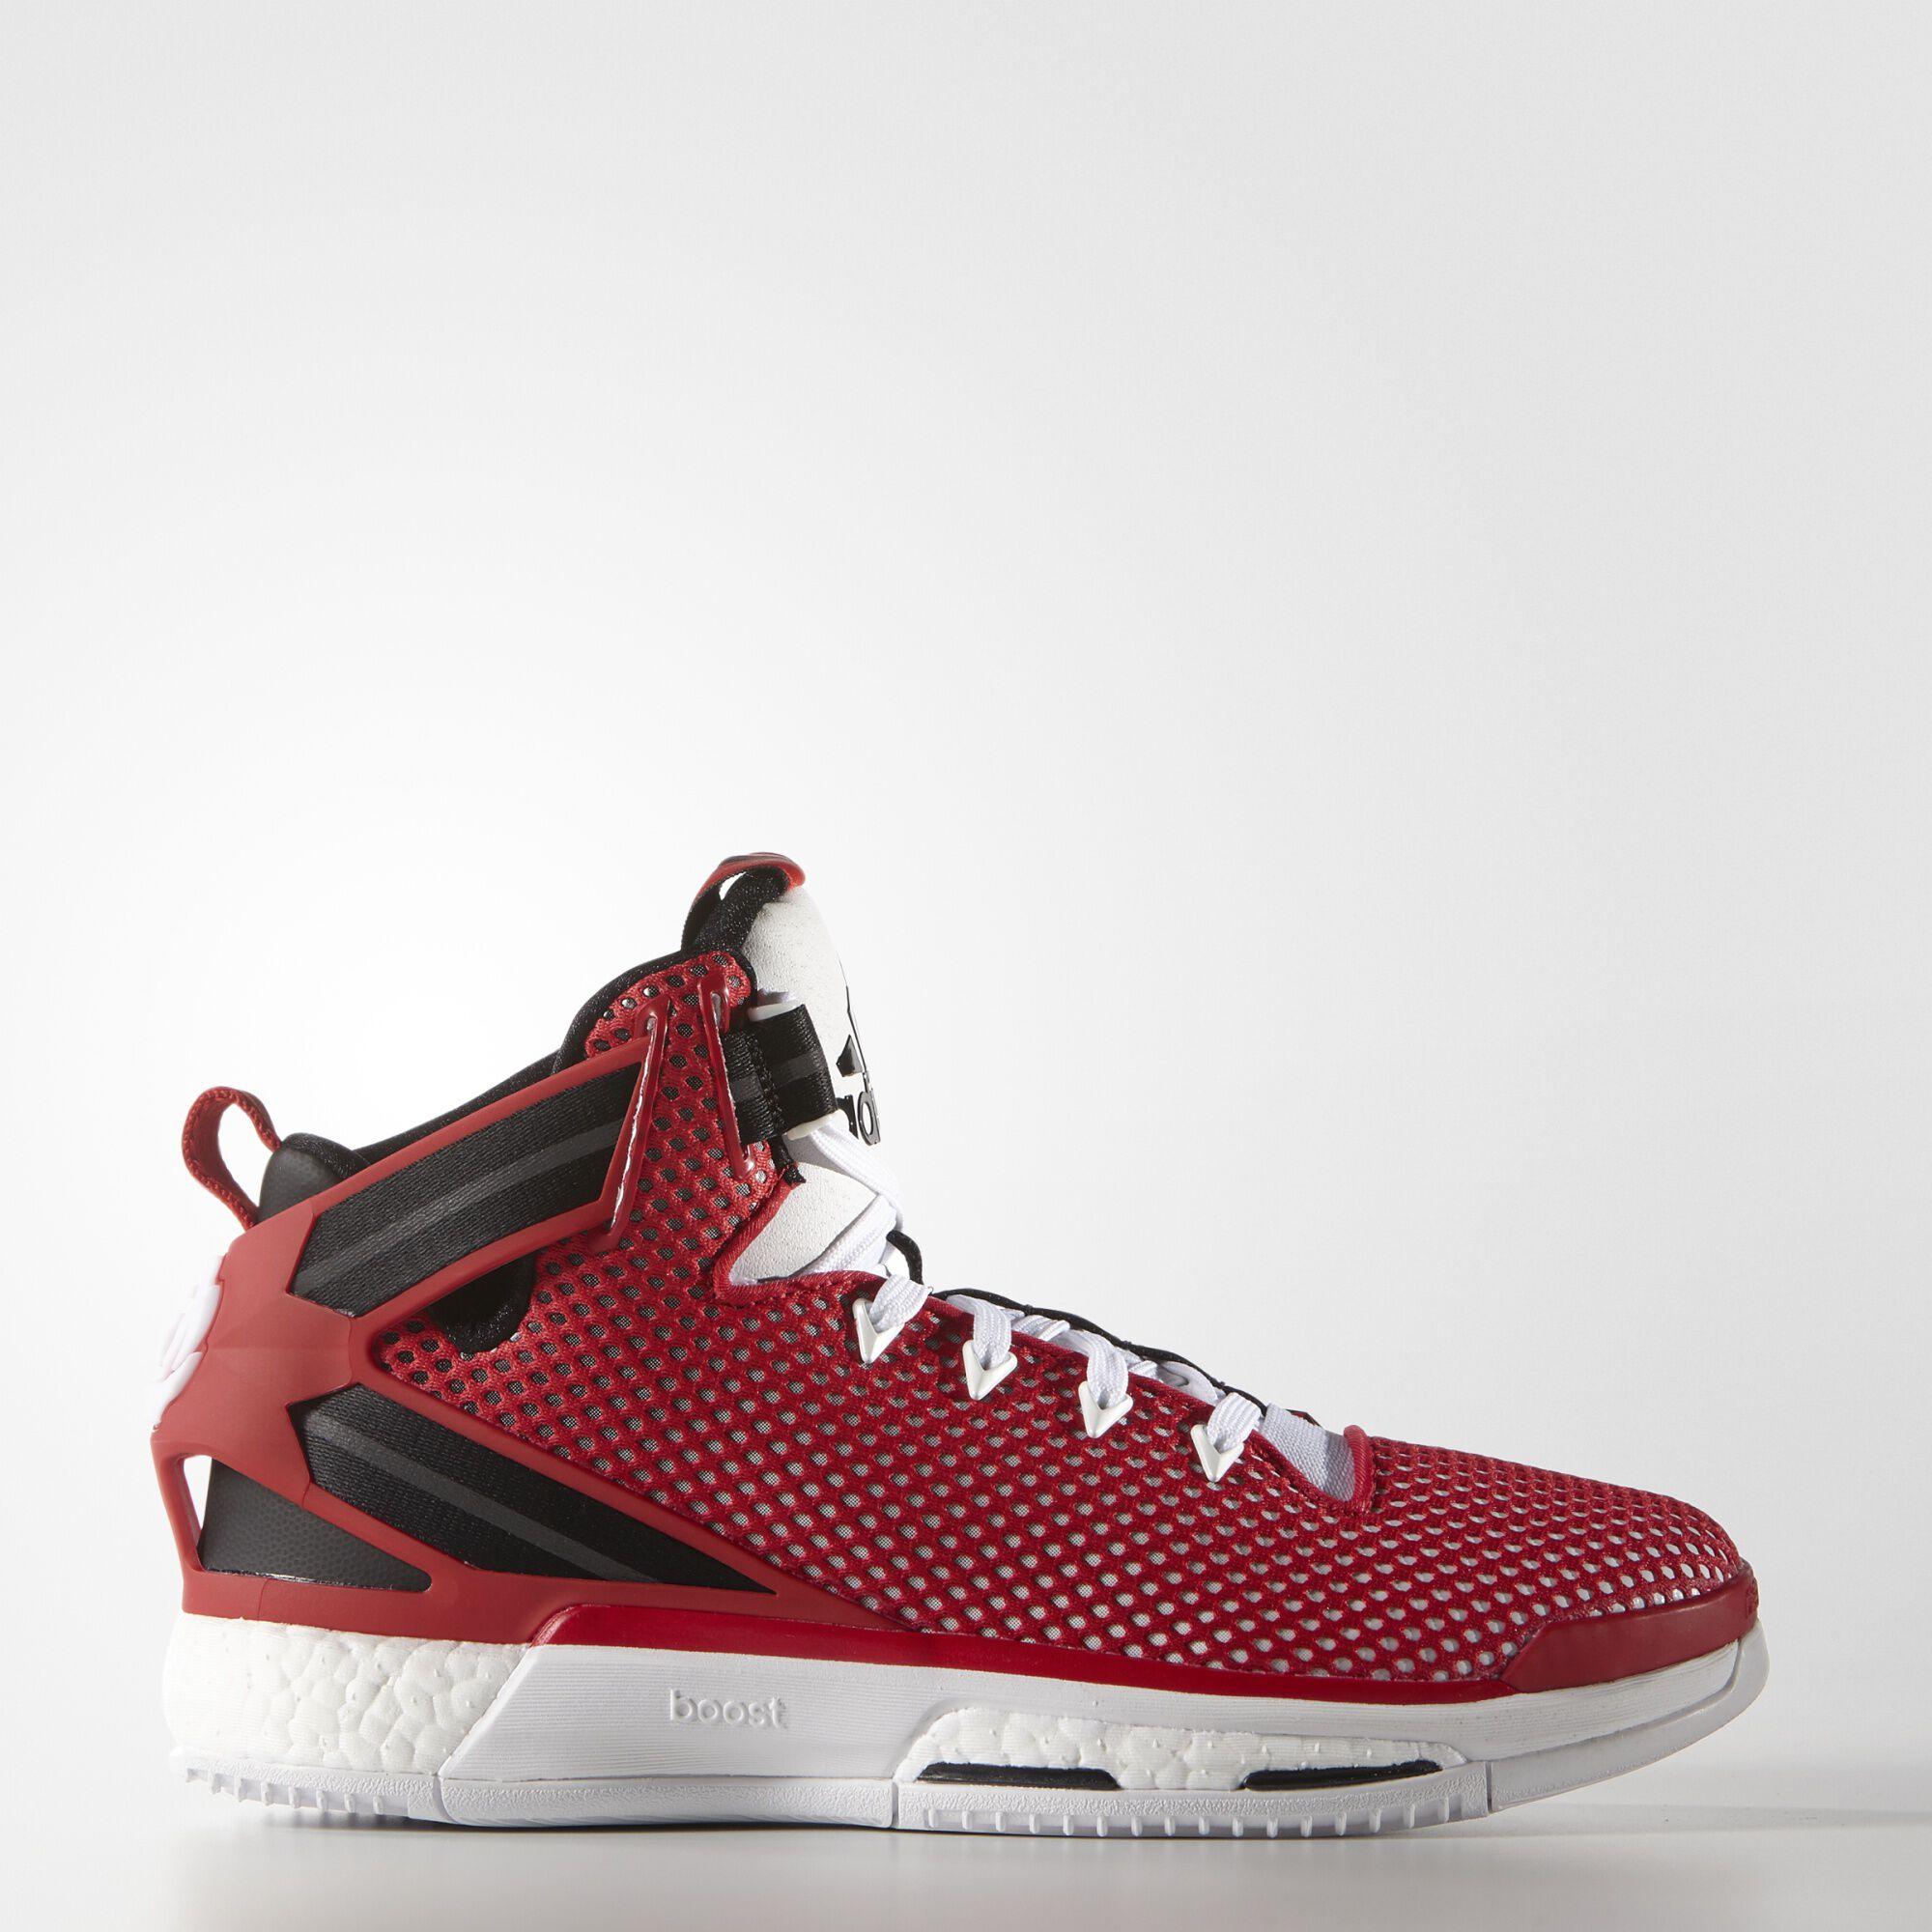 Superstar Chaussure adidas store online Basket usa Femme Adidas TwwzAqxX